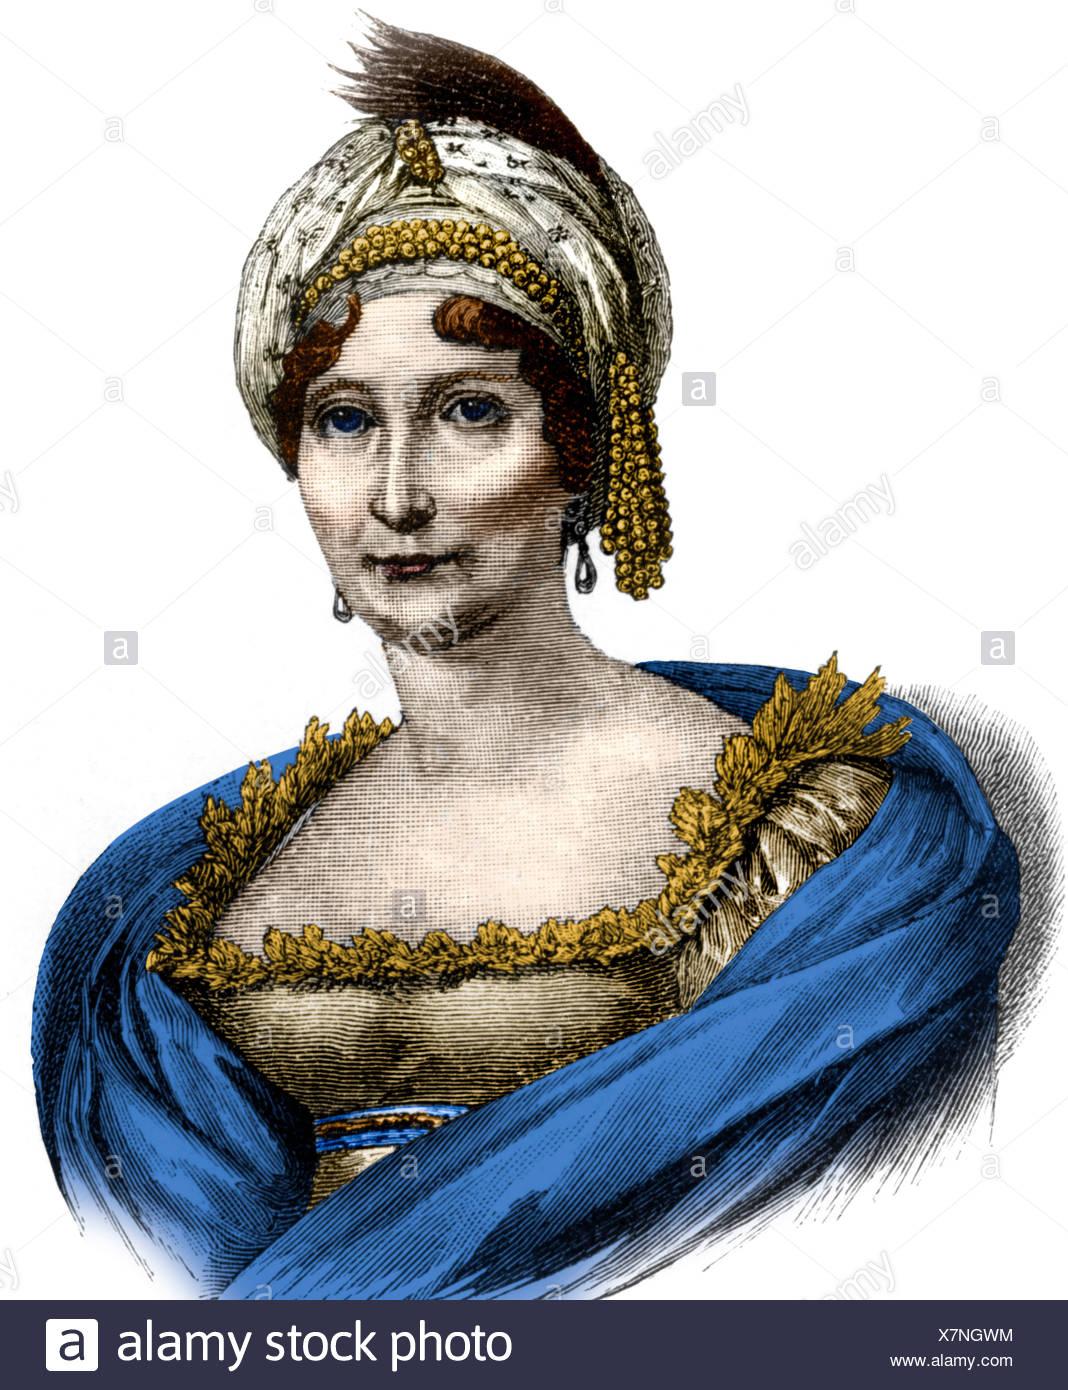 Buonaparte, Laetizia, 24.8.1750 - 2.5.1836, Corsican noblewoman, portrait, wood engraving, 19th century, later coloured,  Letiti - Stock Image